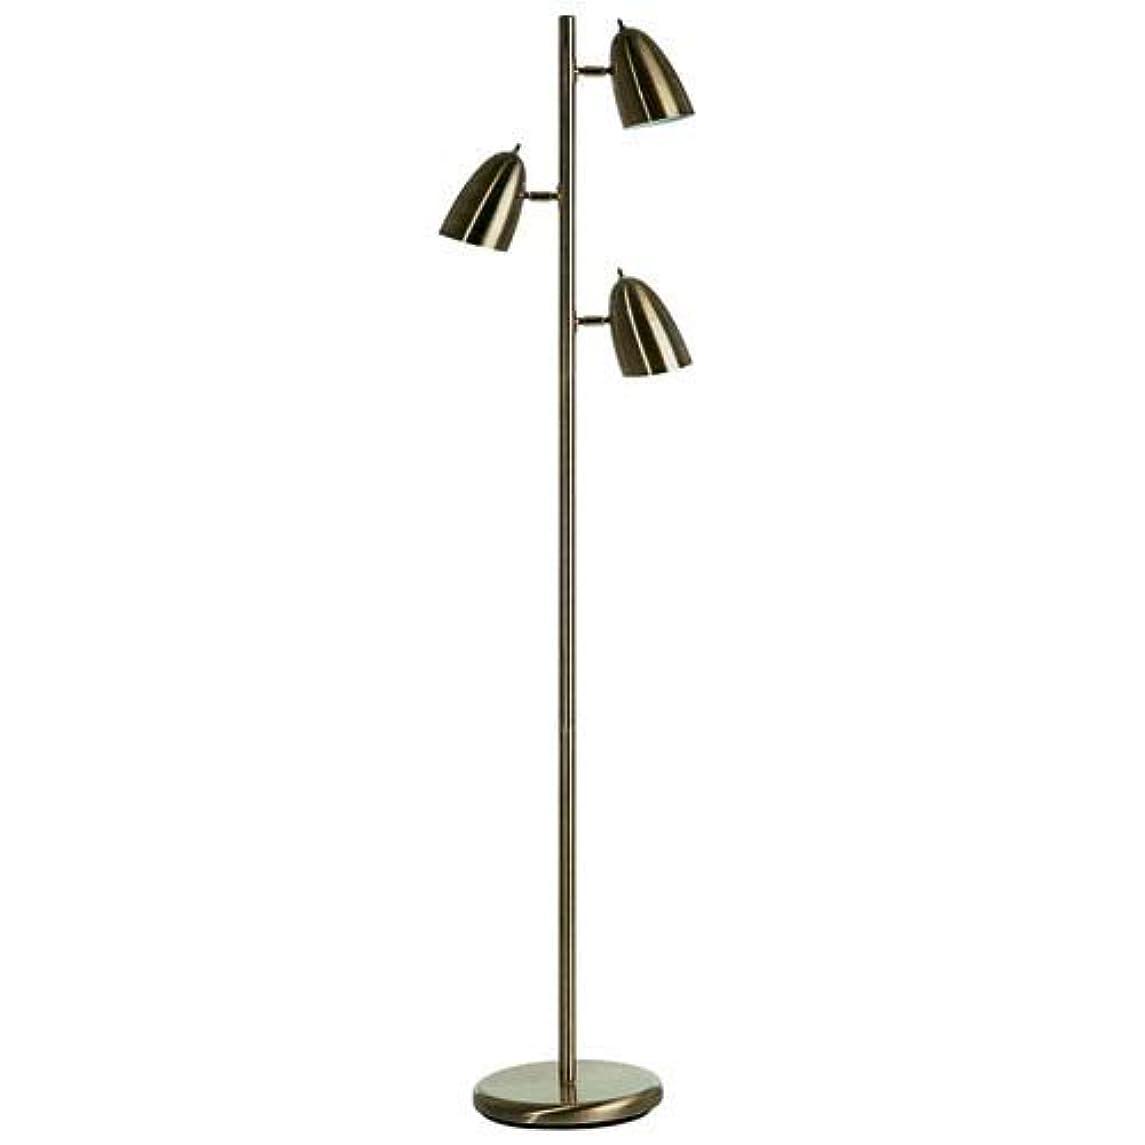 Dainolite Lighting DM330FAB Floor Lamp, 14